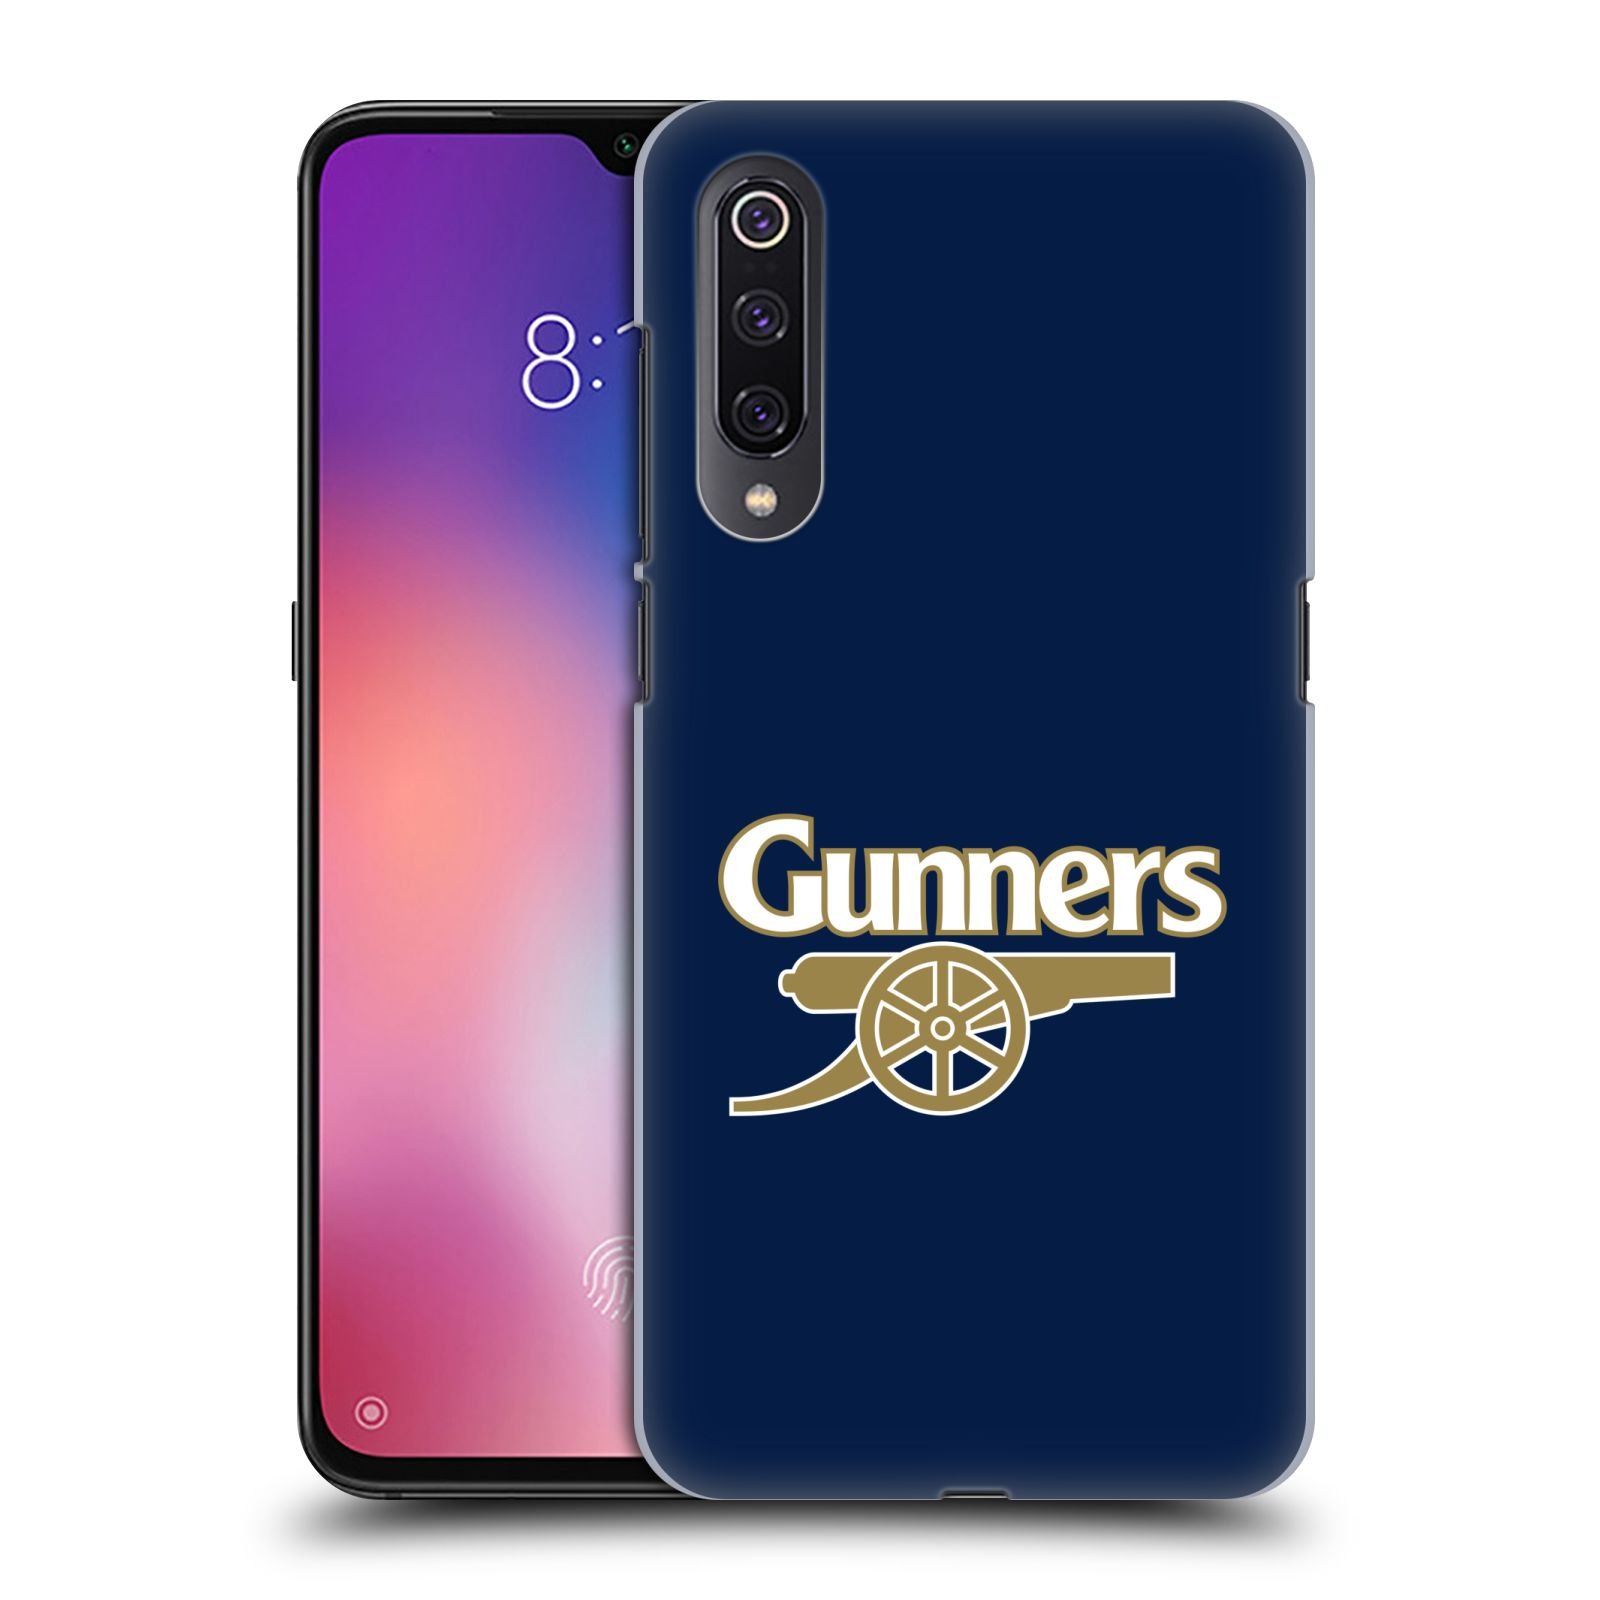 Plastové pouzdro na mobil Xiaomi Mi 9 - Head Case - Arsenal FC - Gunners